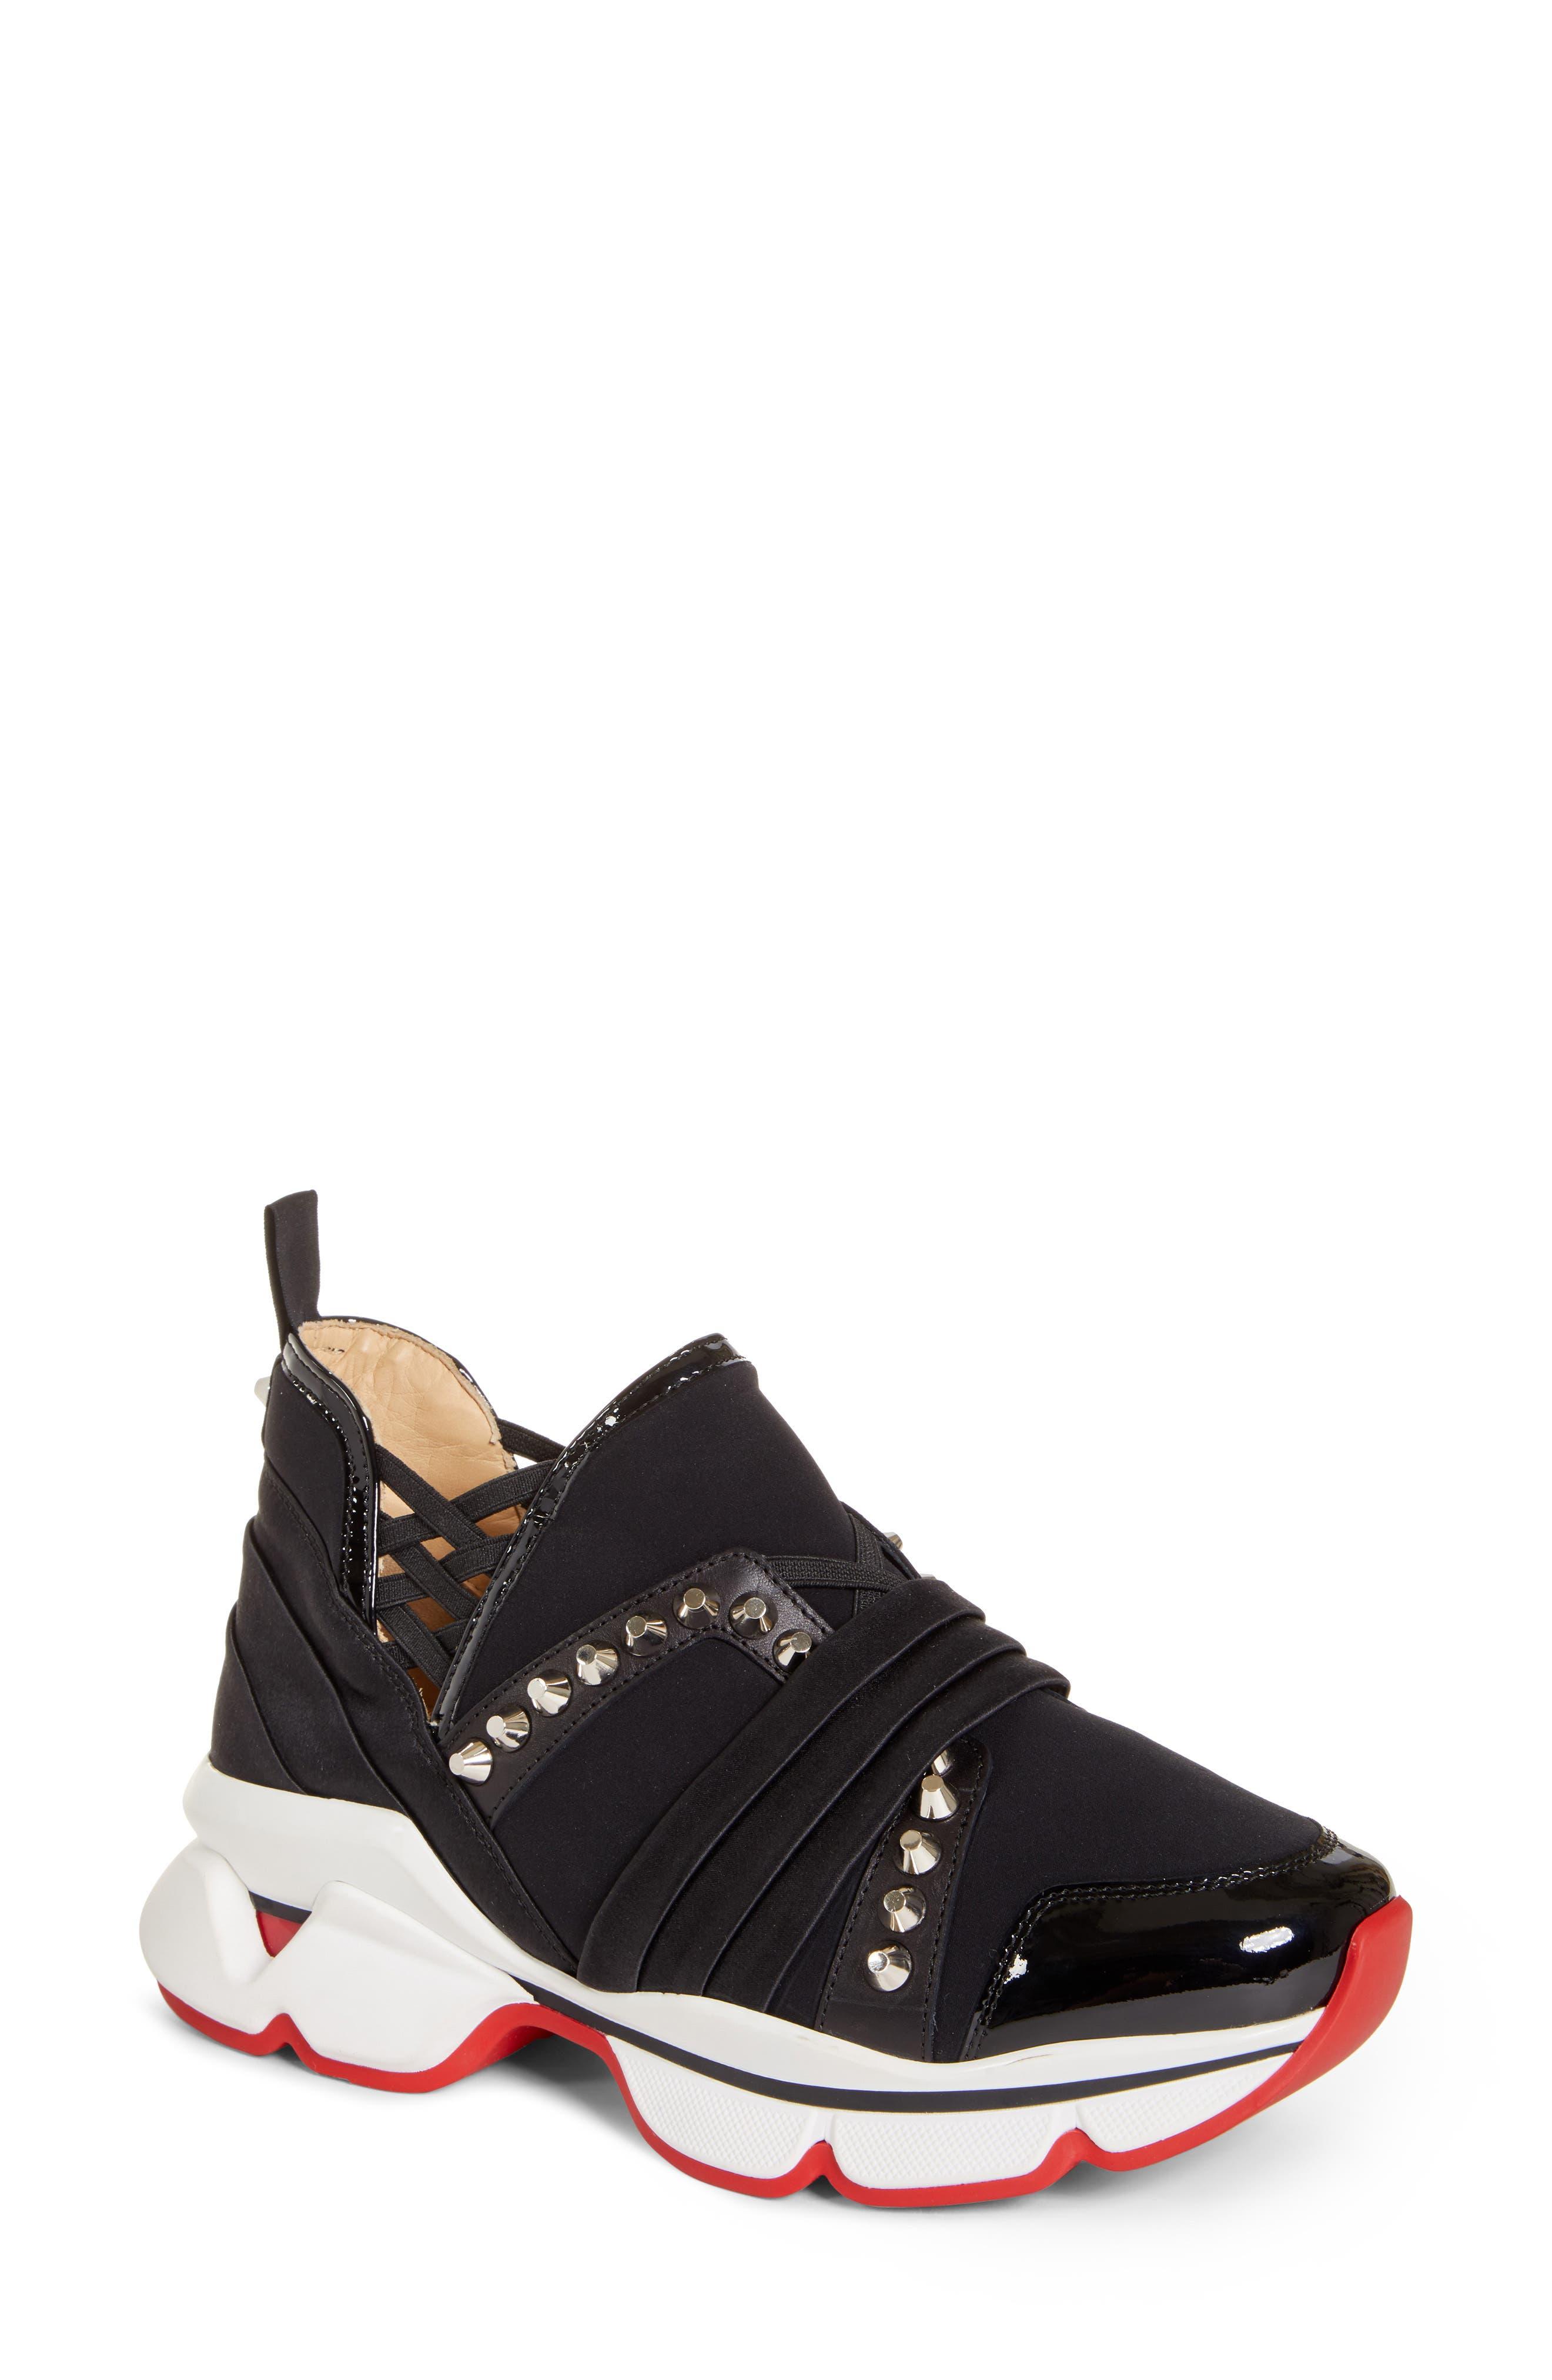 Christian Louboutin Run Slip-On Sneaker